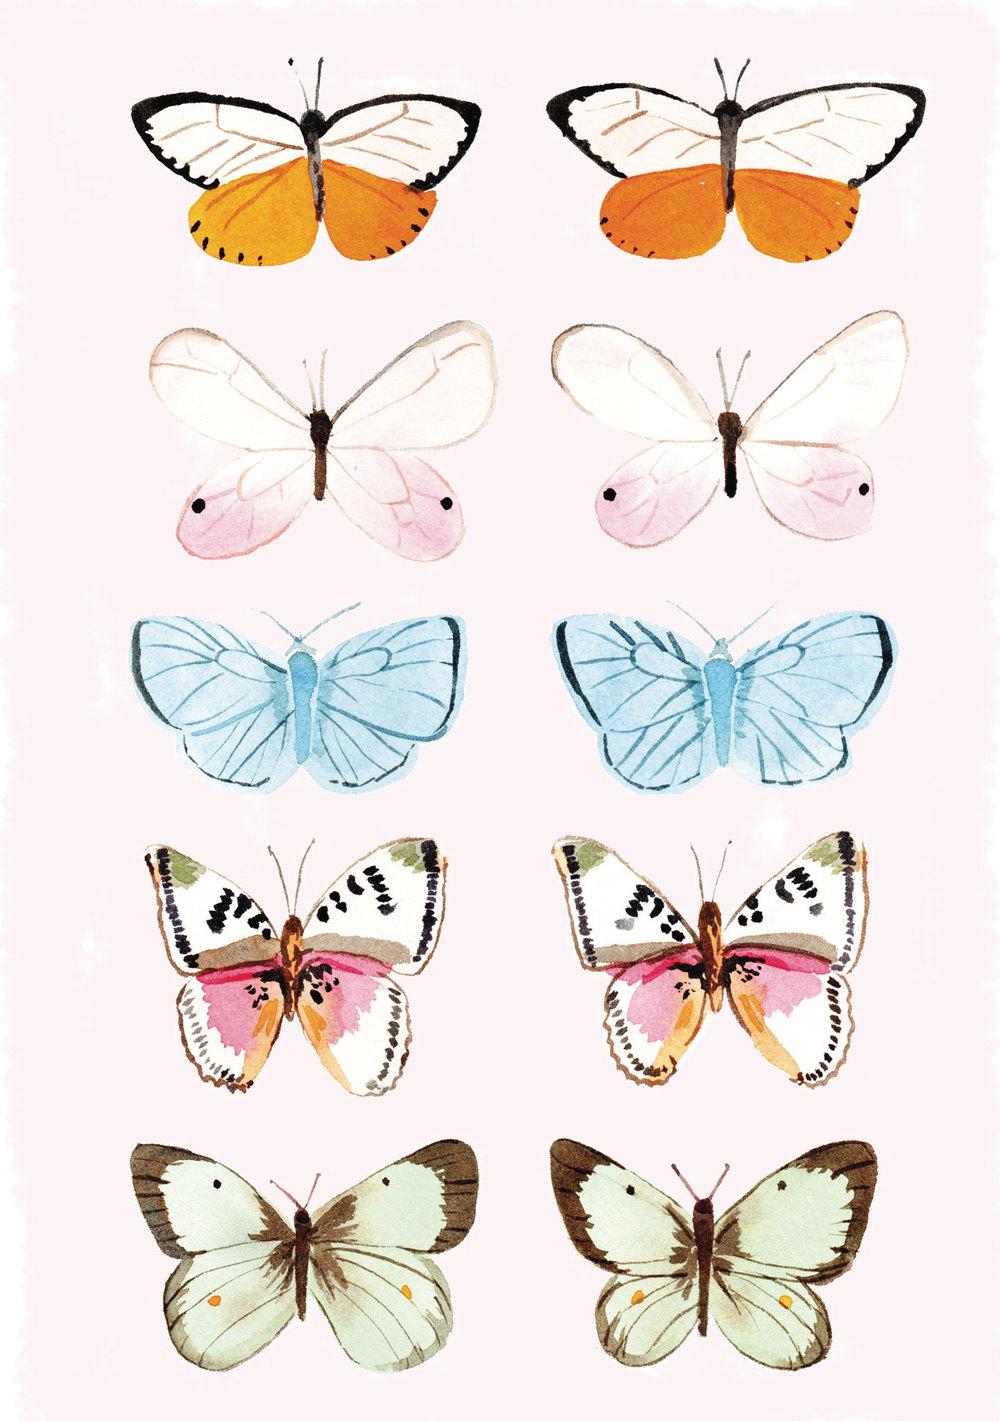 MeganKelso_ButterflyStudy-01.jpg